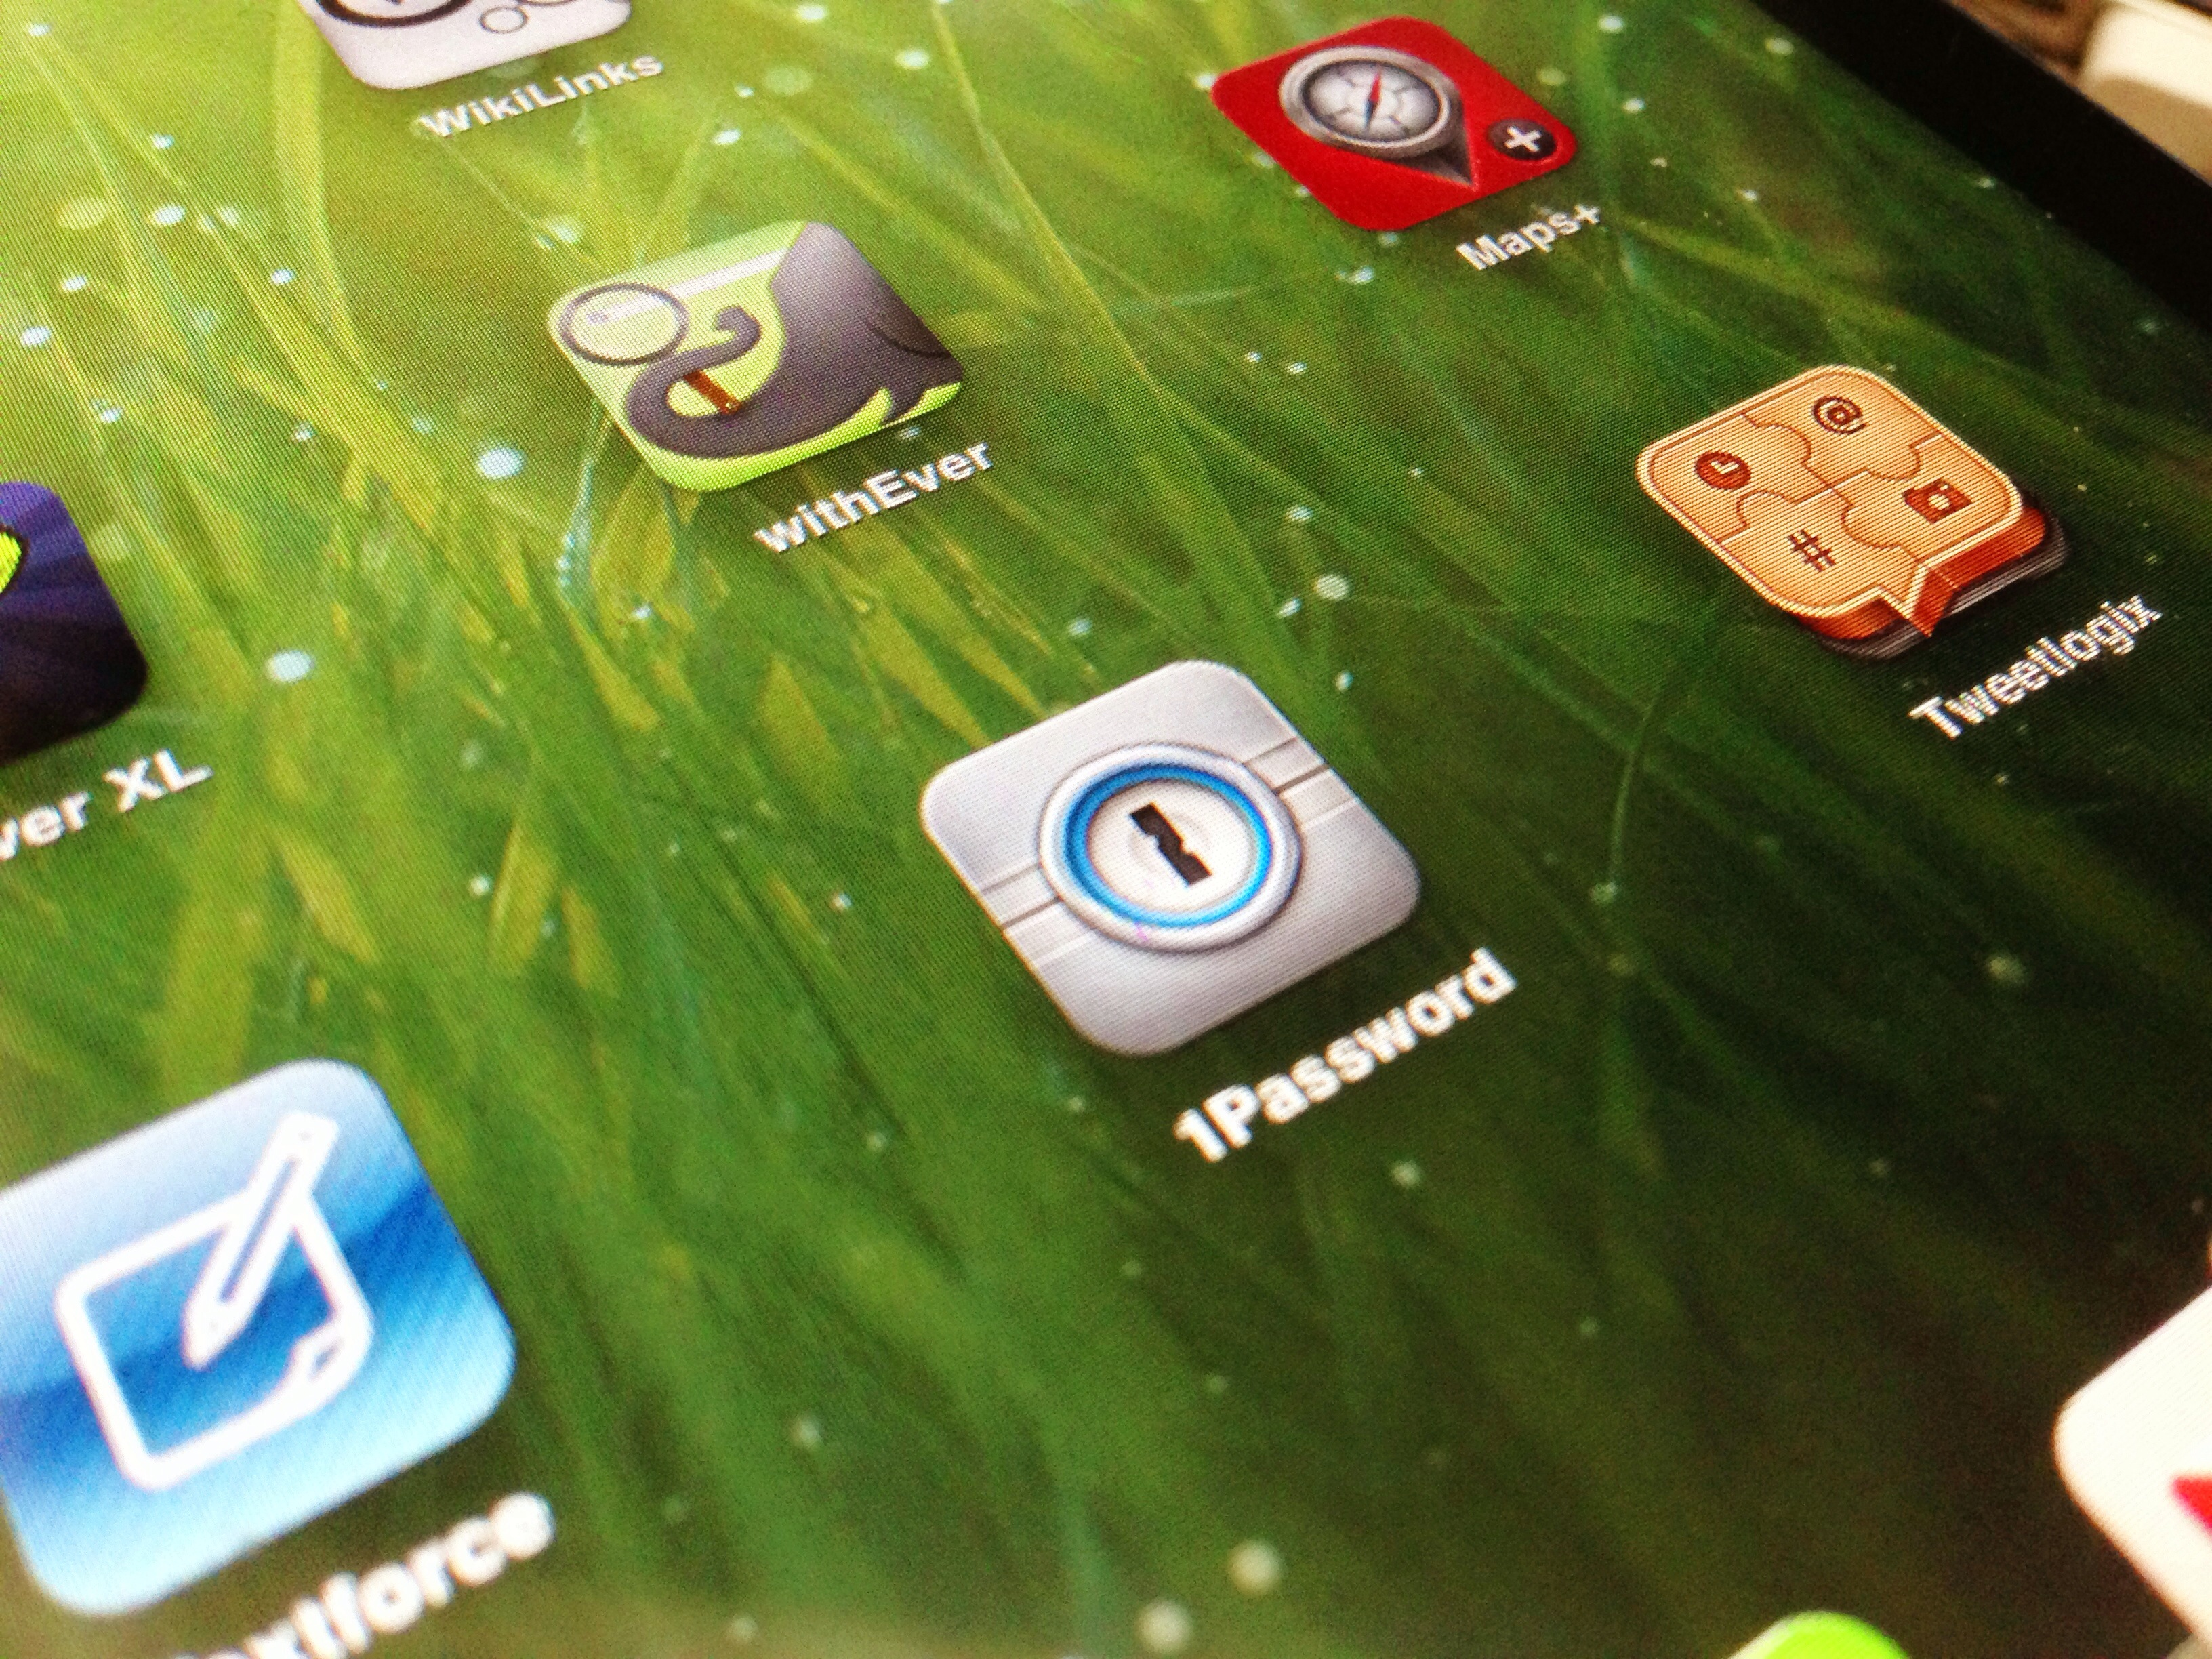 Evernoteが不正アクセスで全ユーザーのパスワードリセット!iPhoneを使っているなら今こそセキュリティ向上のために1Password!